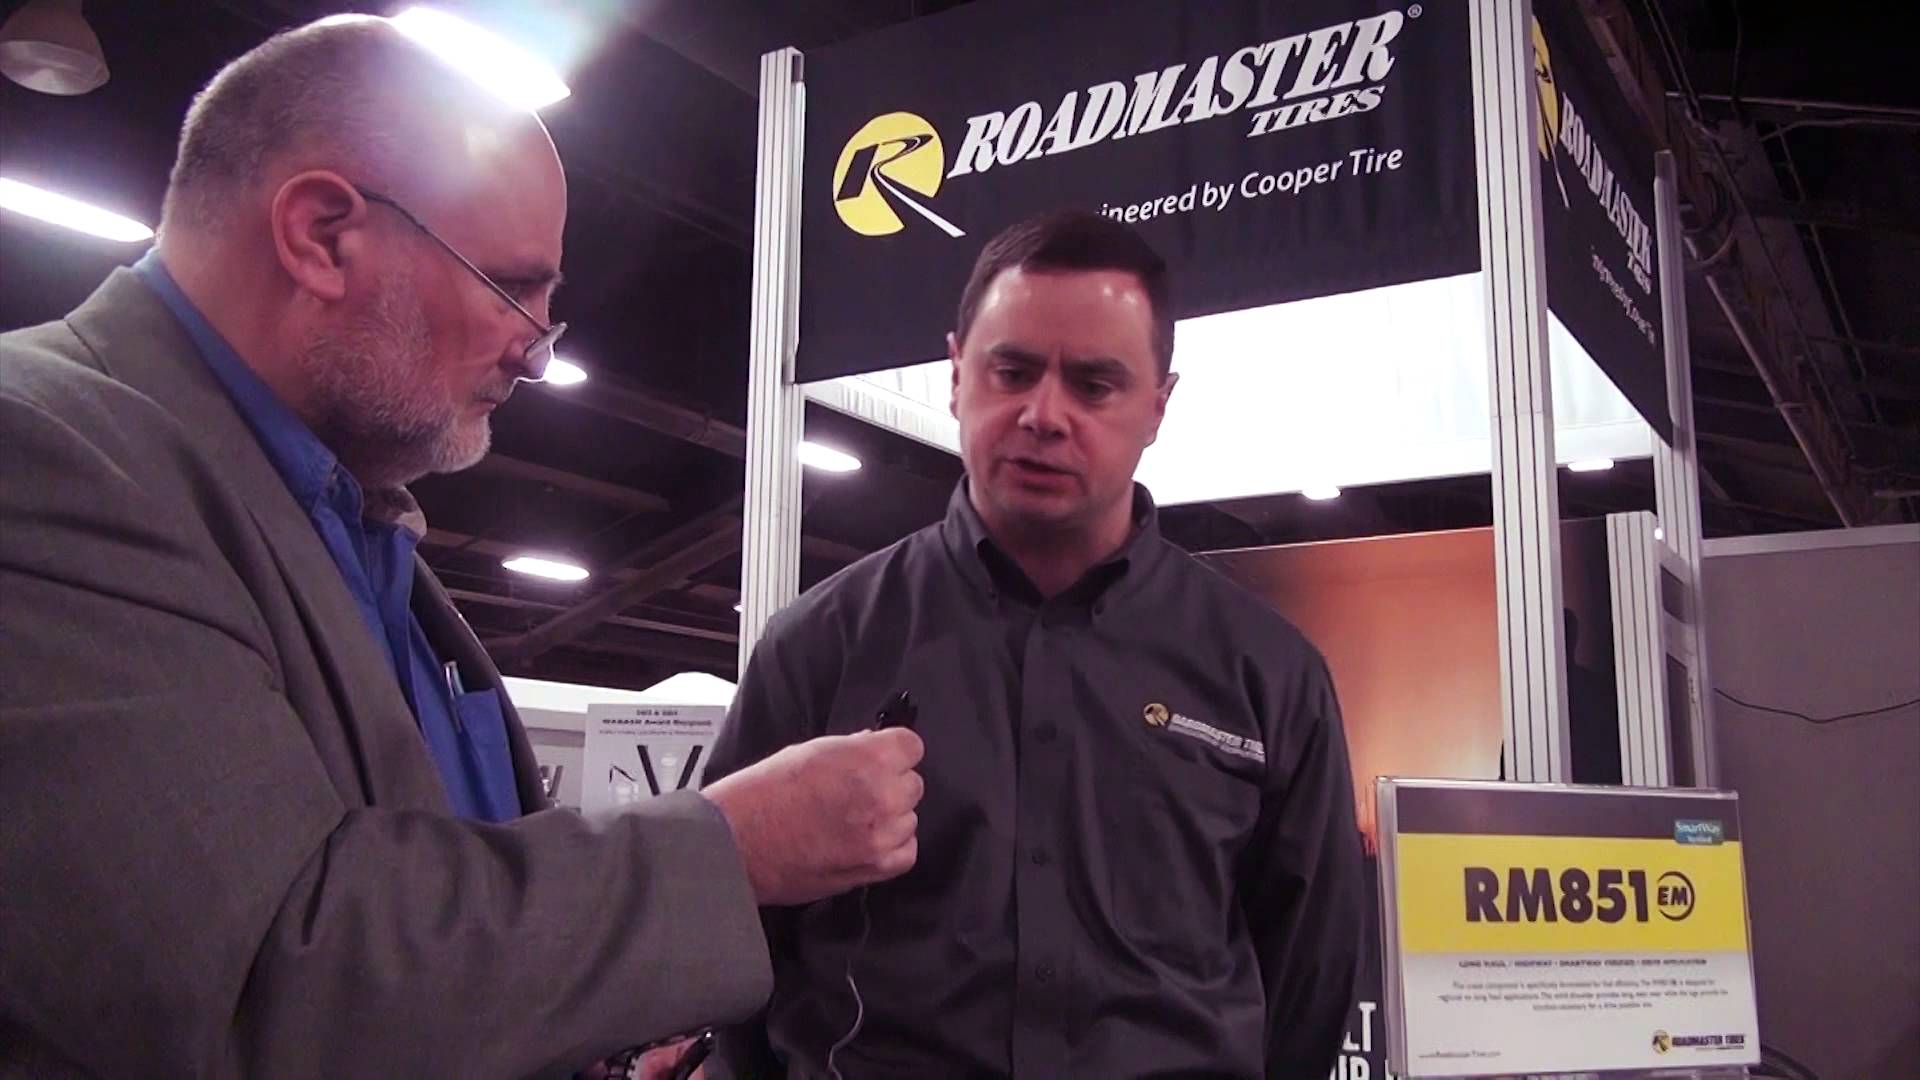 New Roadmaster tires, tools debut at MATS 2014